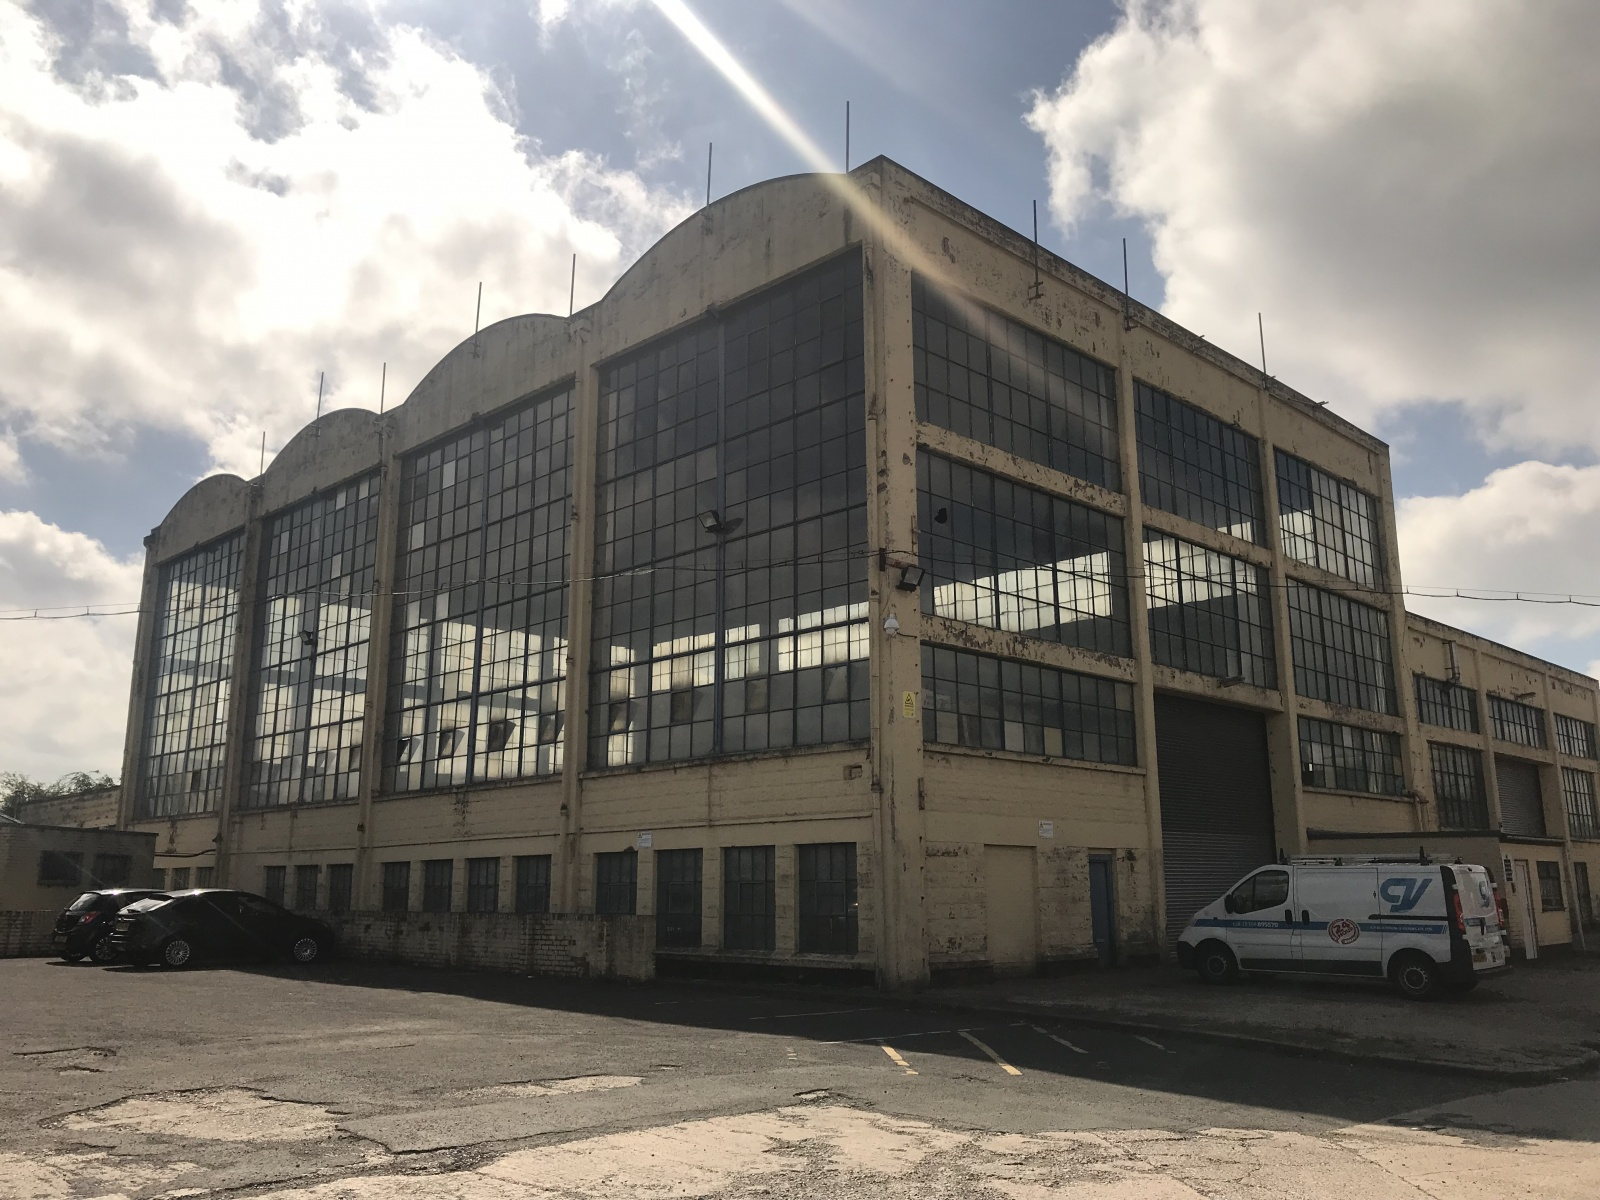 Unit 8 Legg Brothers Trading Estate, Spring Road, Wolverhampton, West Midlands